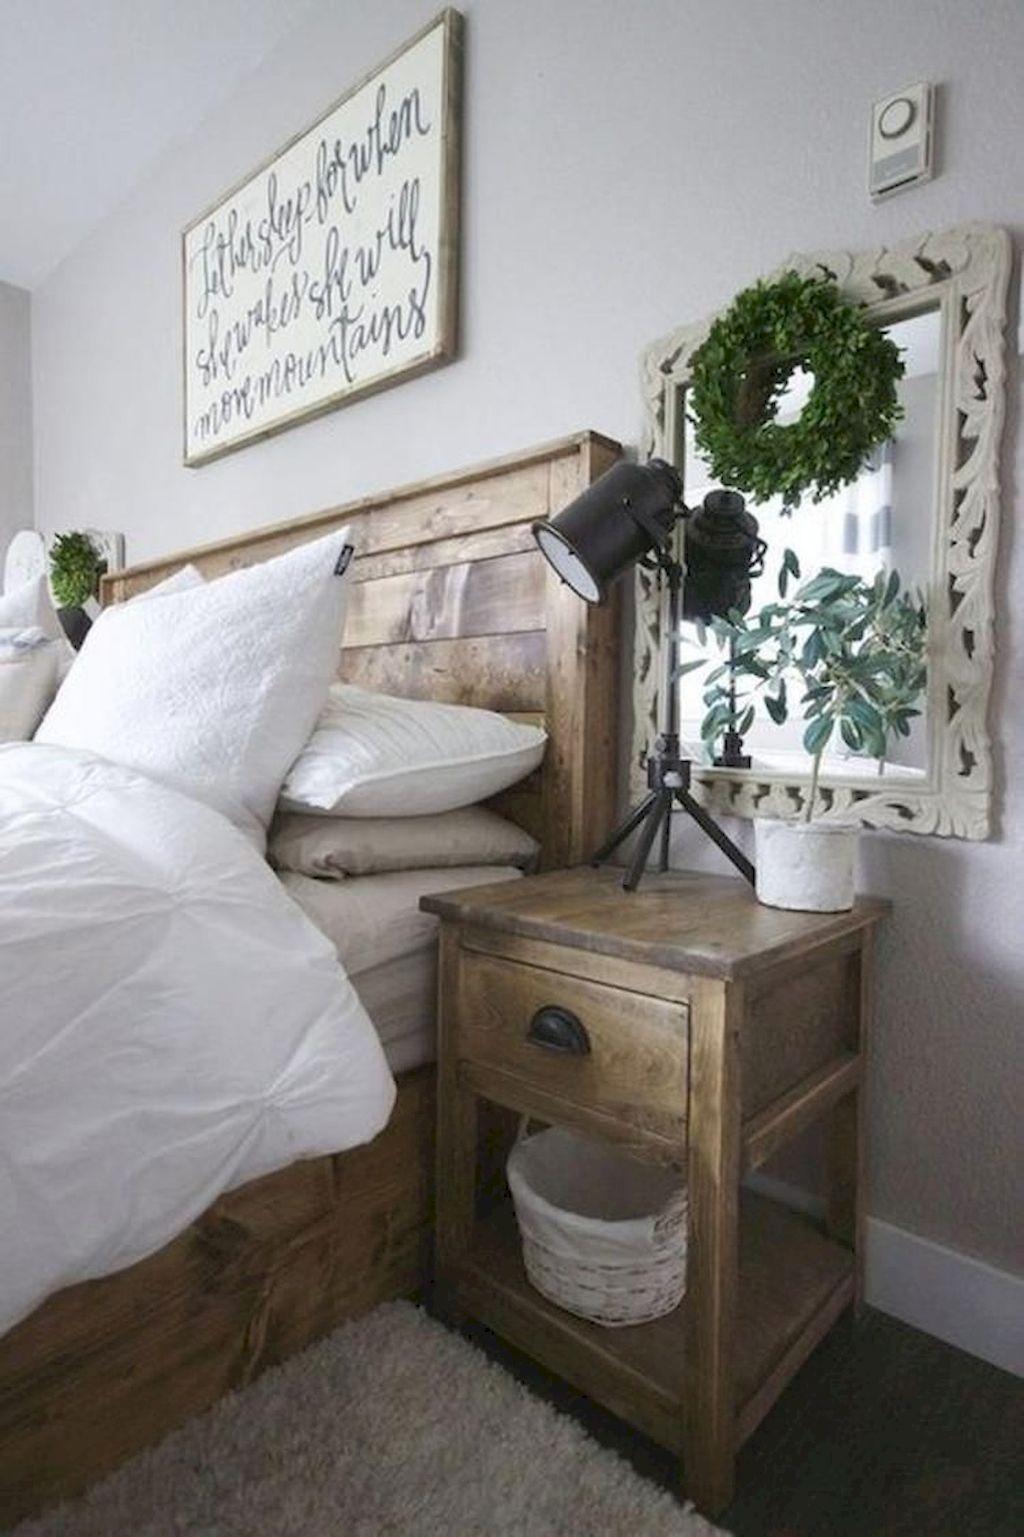 90 Modern Bedroom For Farmhouse Design Ideas Http Probathroomidea Info 90 Modern Bedroom For Farmhouse Bedroom Decor Home Decor Bedroom Master Bedrooms Decor